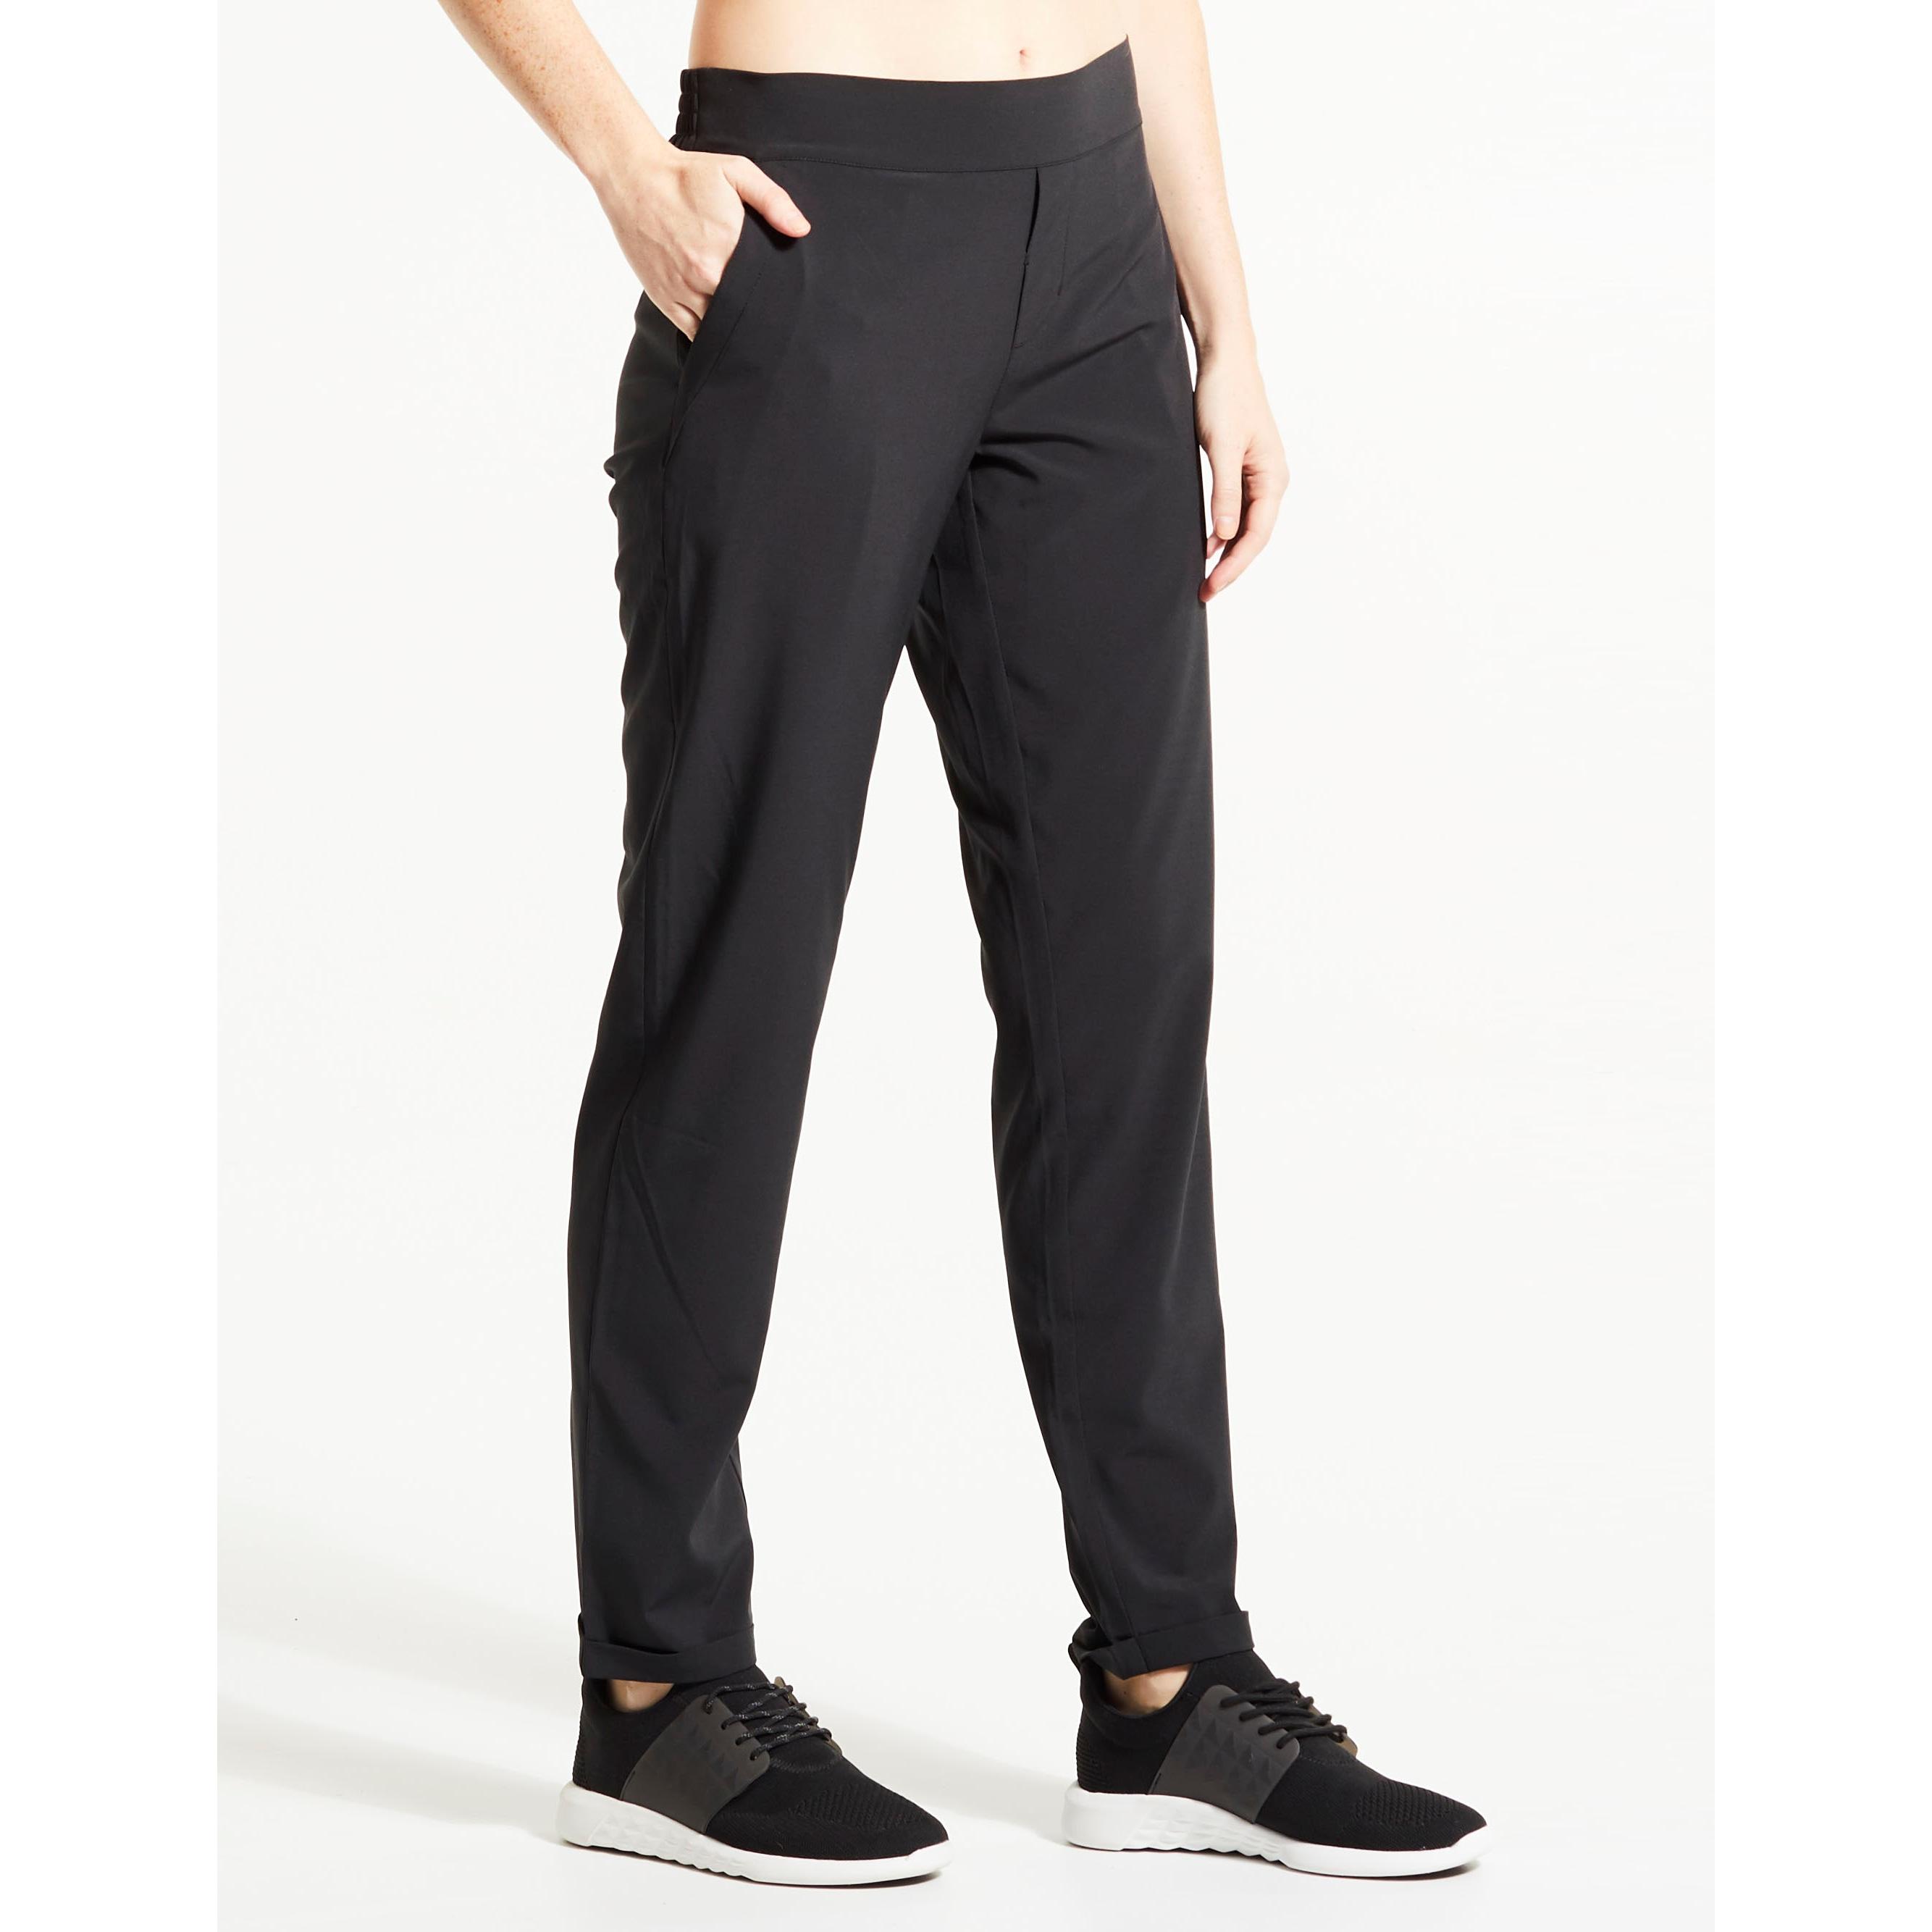 Jib Pants - Women's